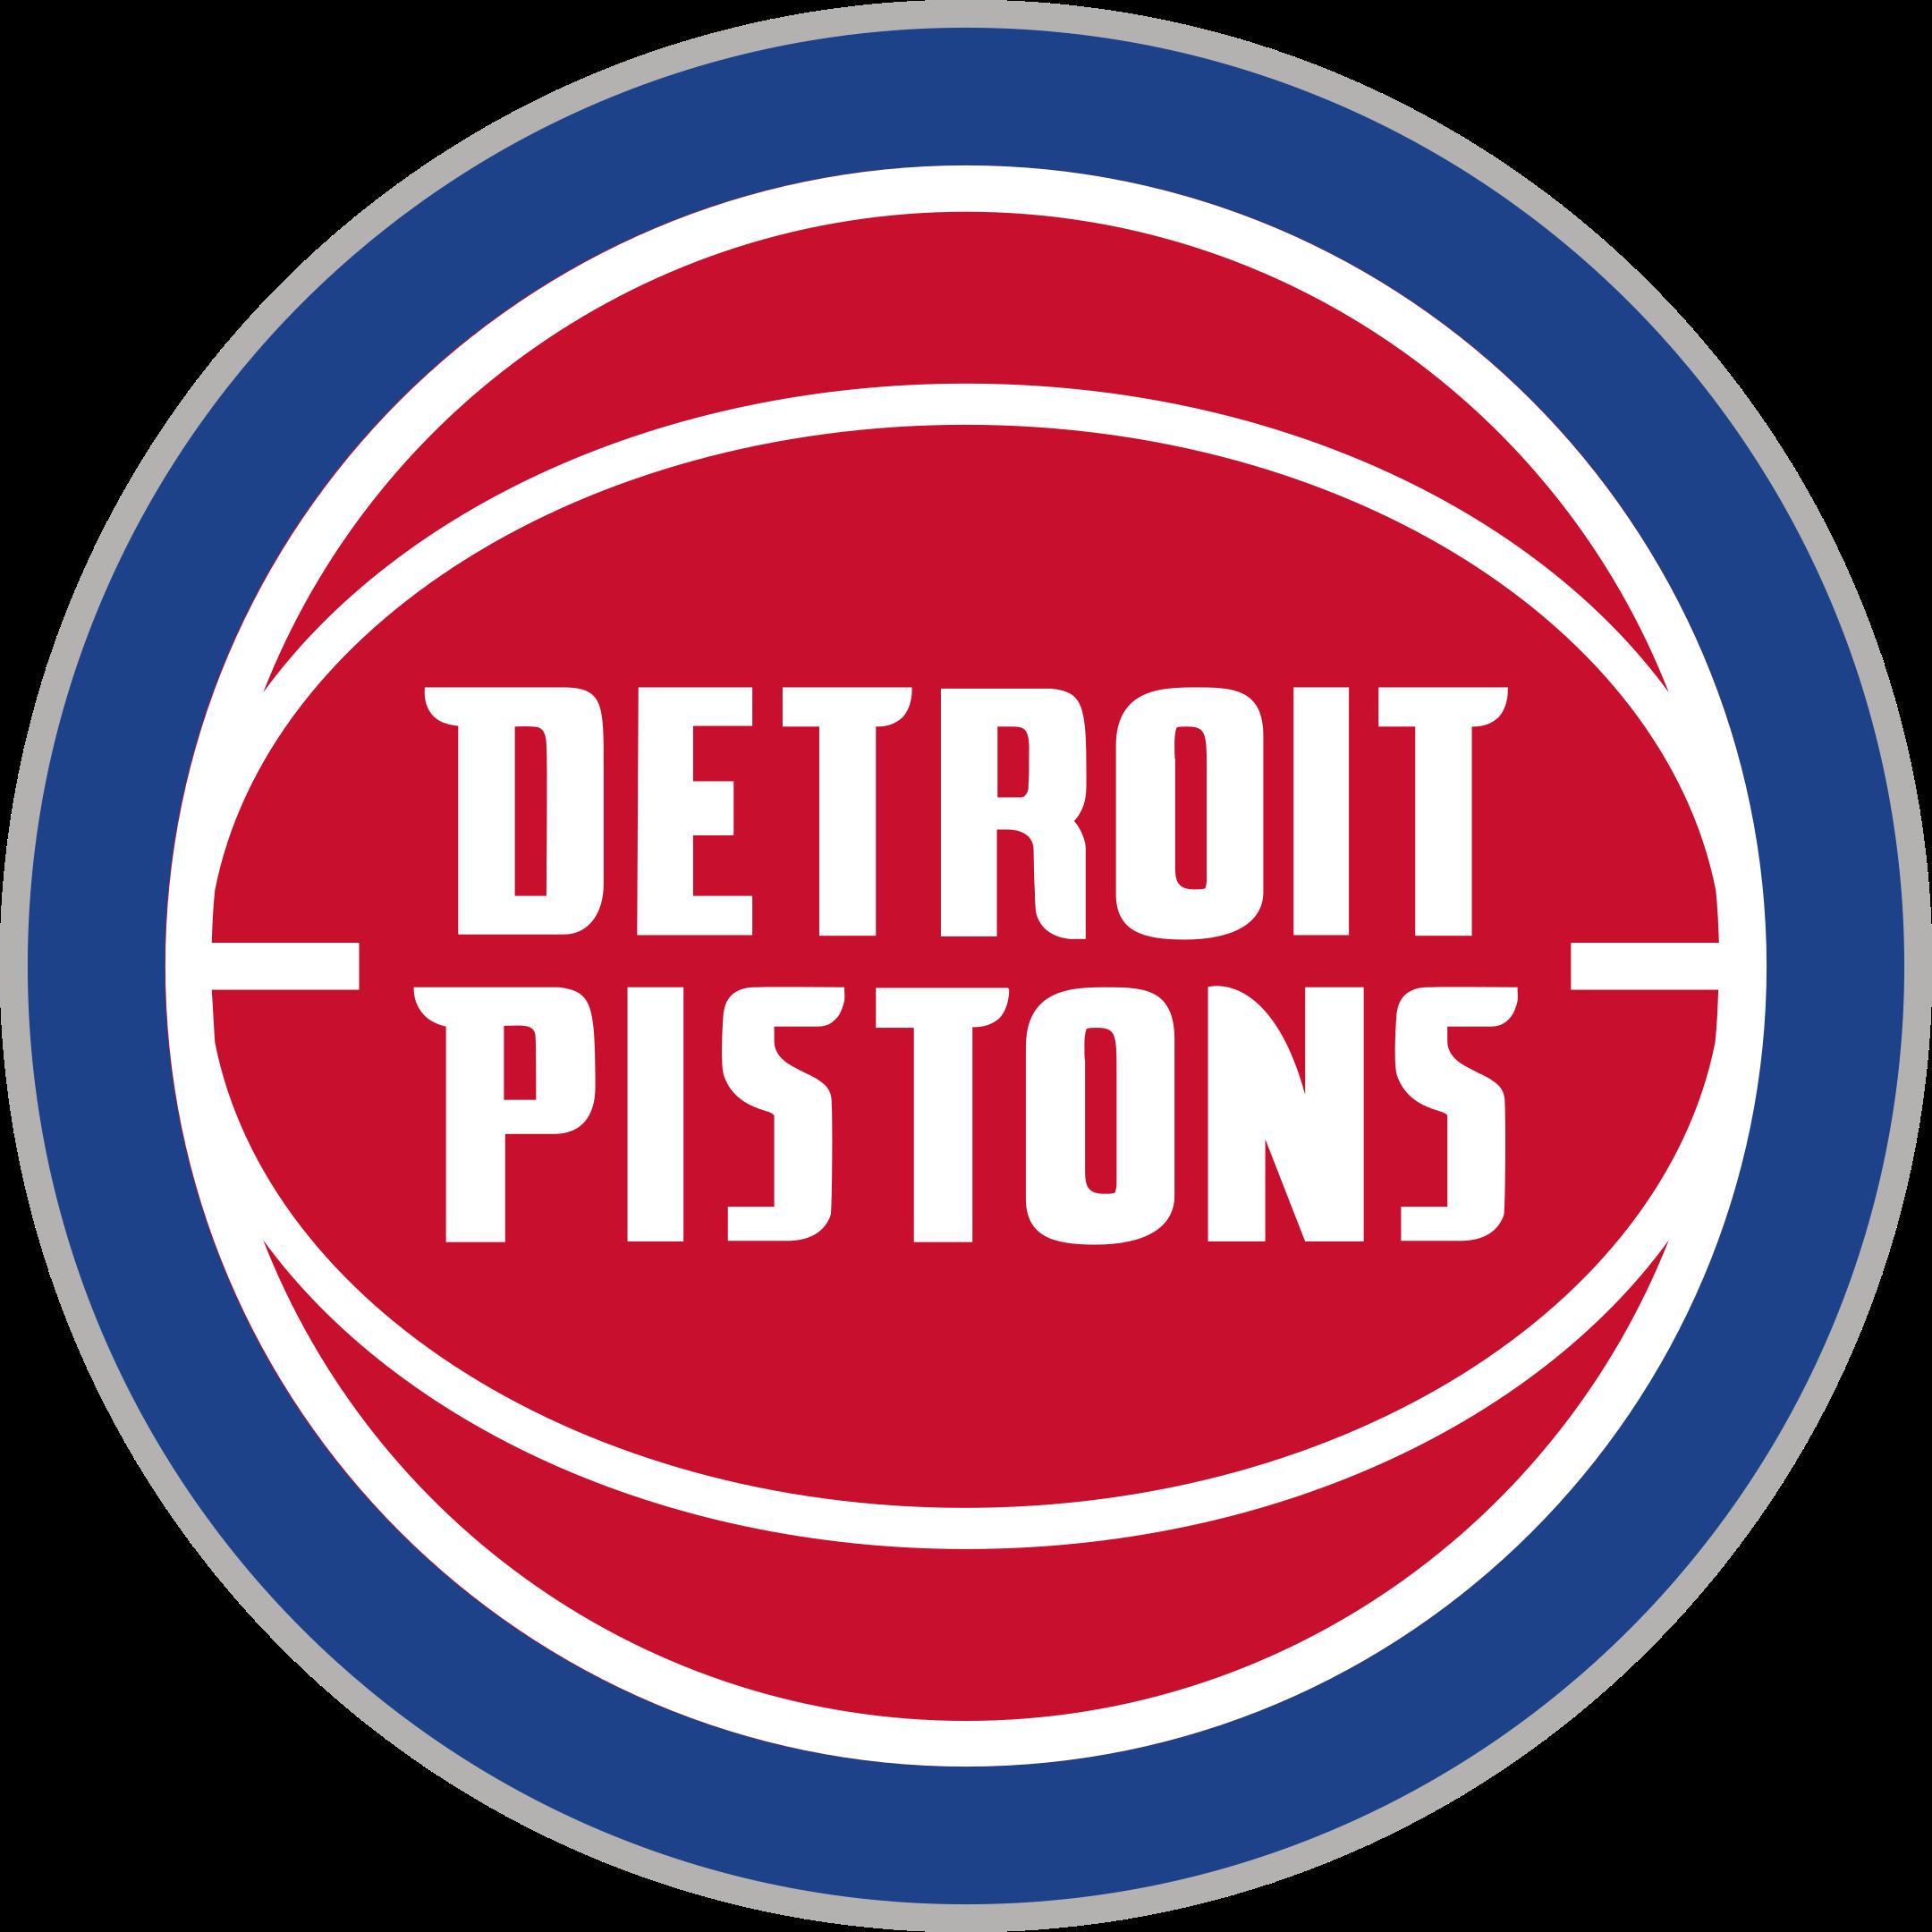 detroit pistons logo 1 - Detroit Pistons Logo